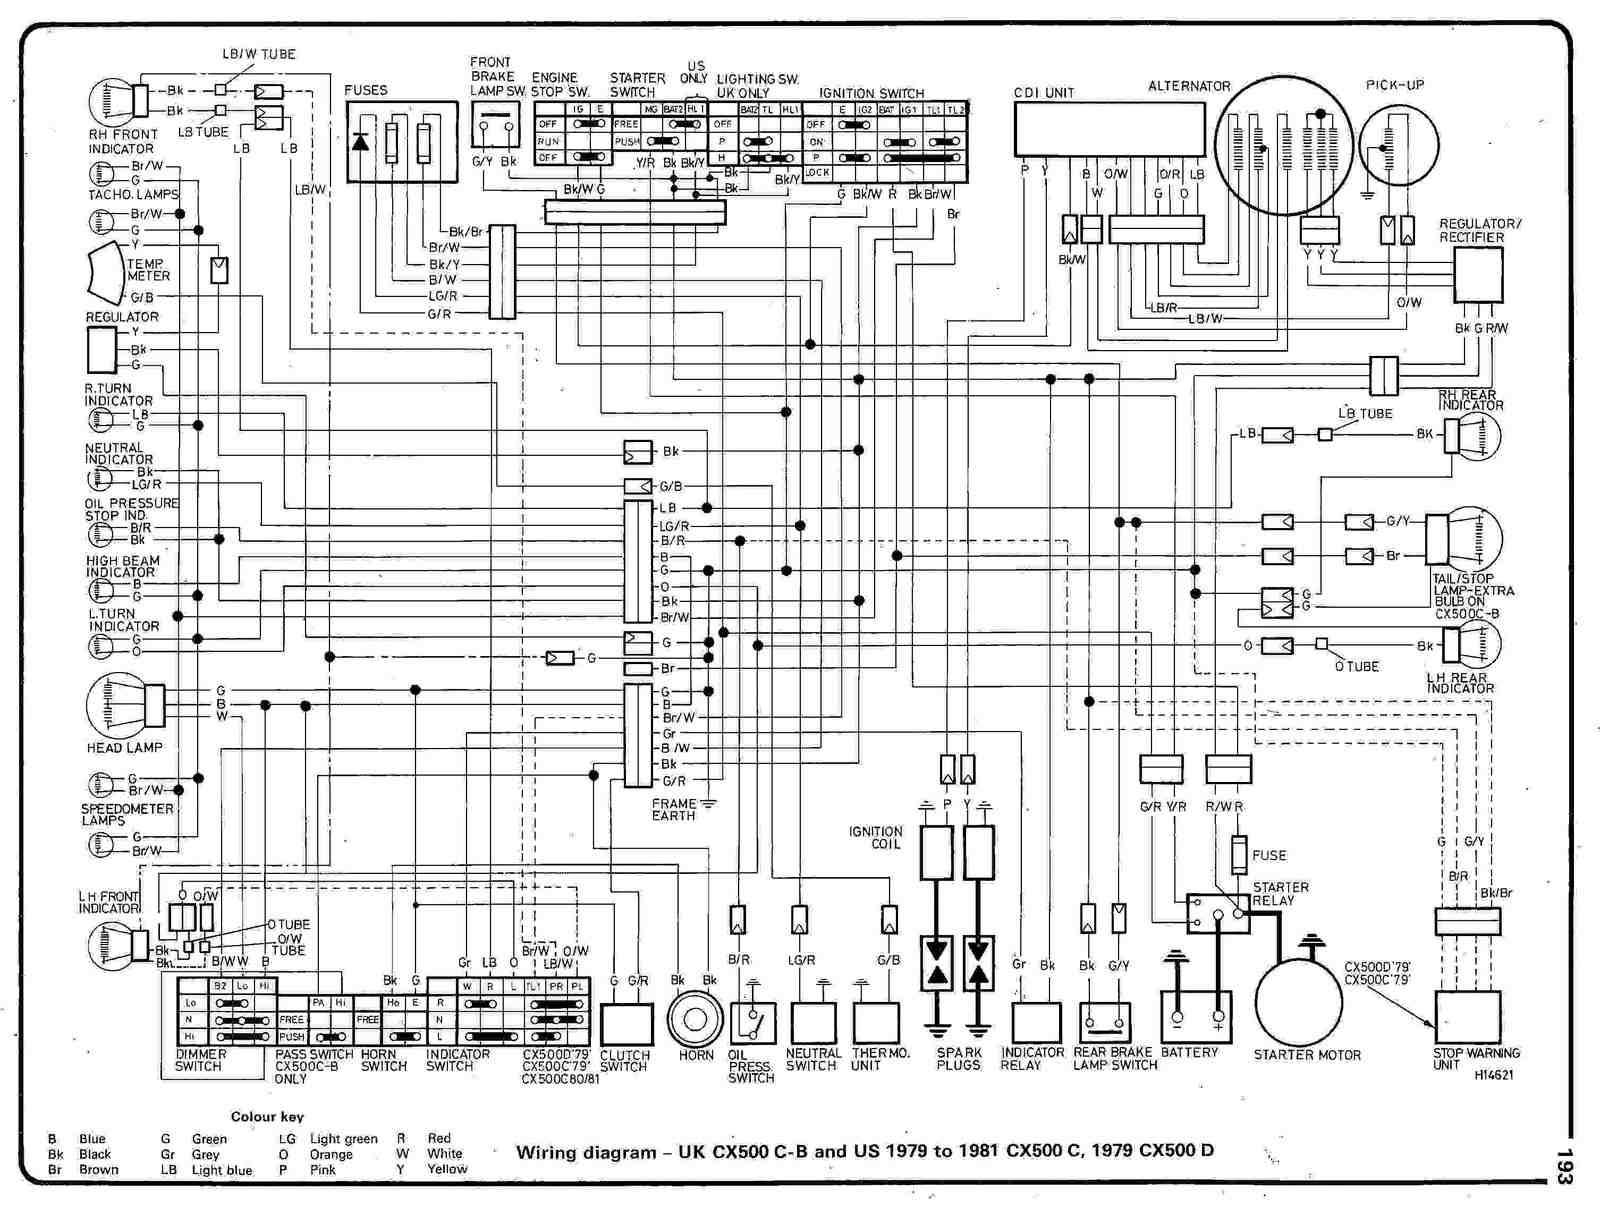 Factory Electrical Wiring Diagram Pdf